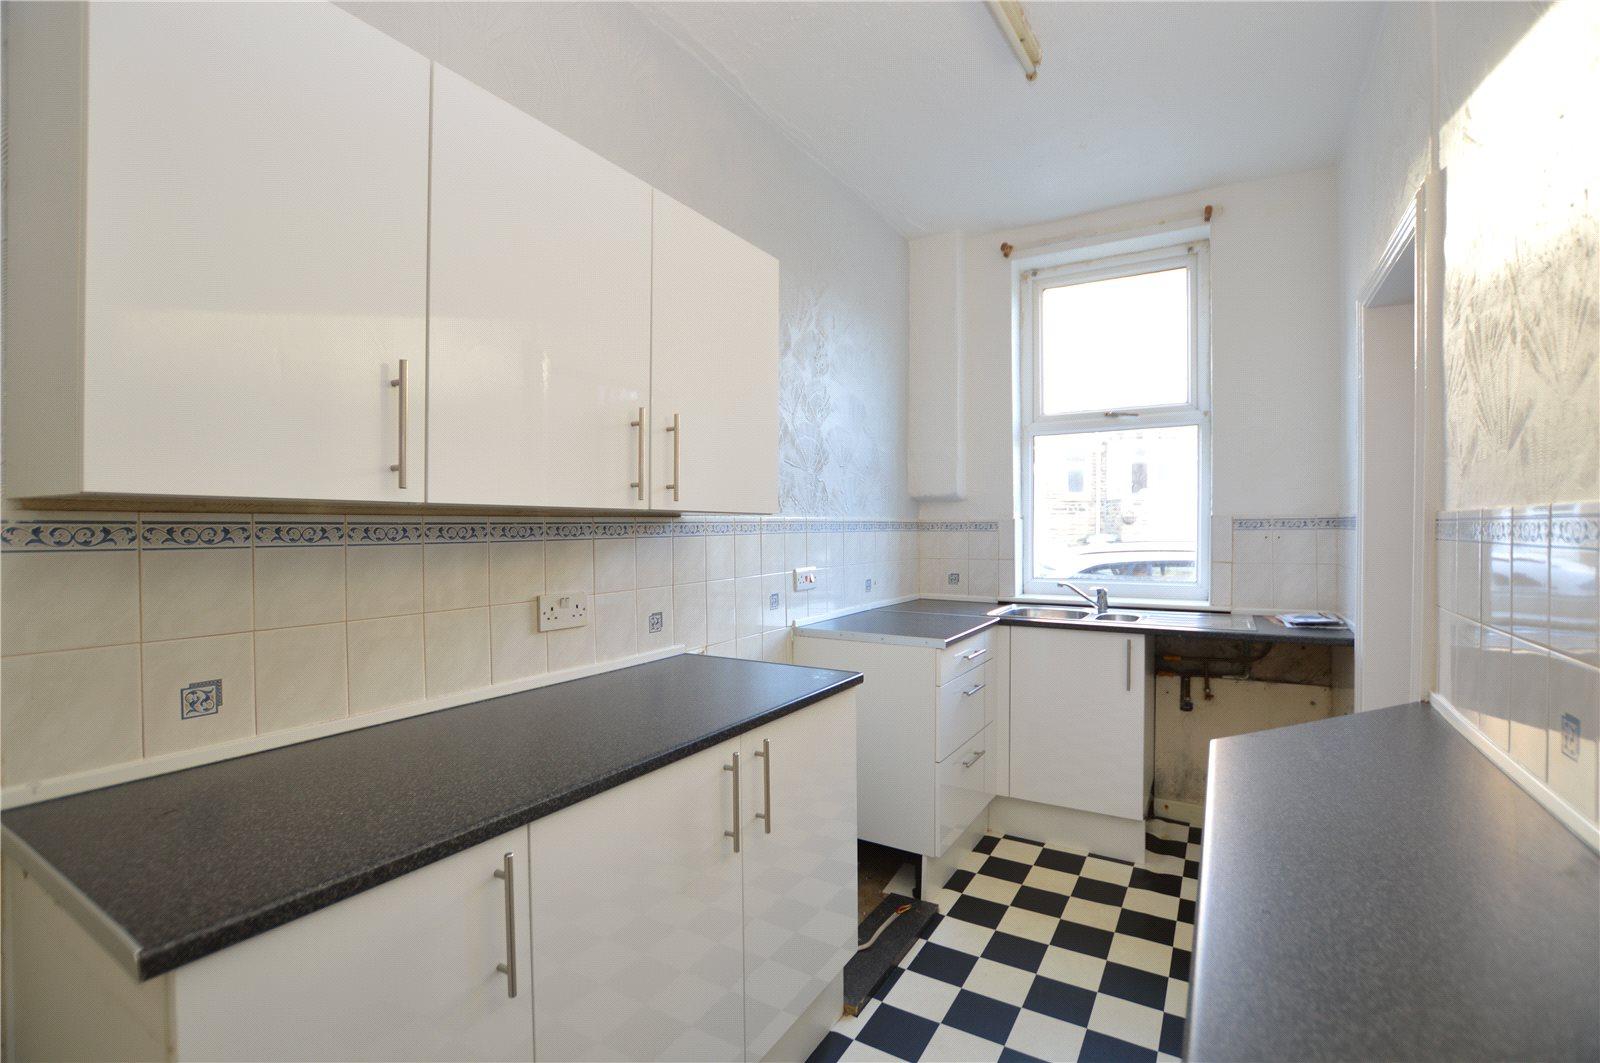 Property for sale in Morley, interior kitchen White tiled floor